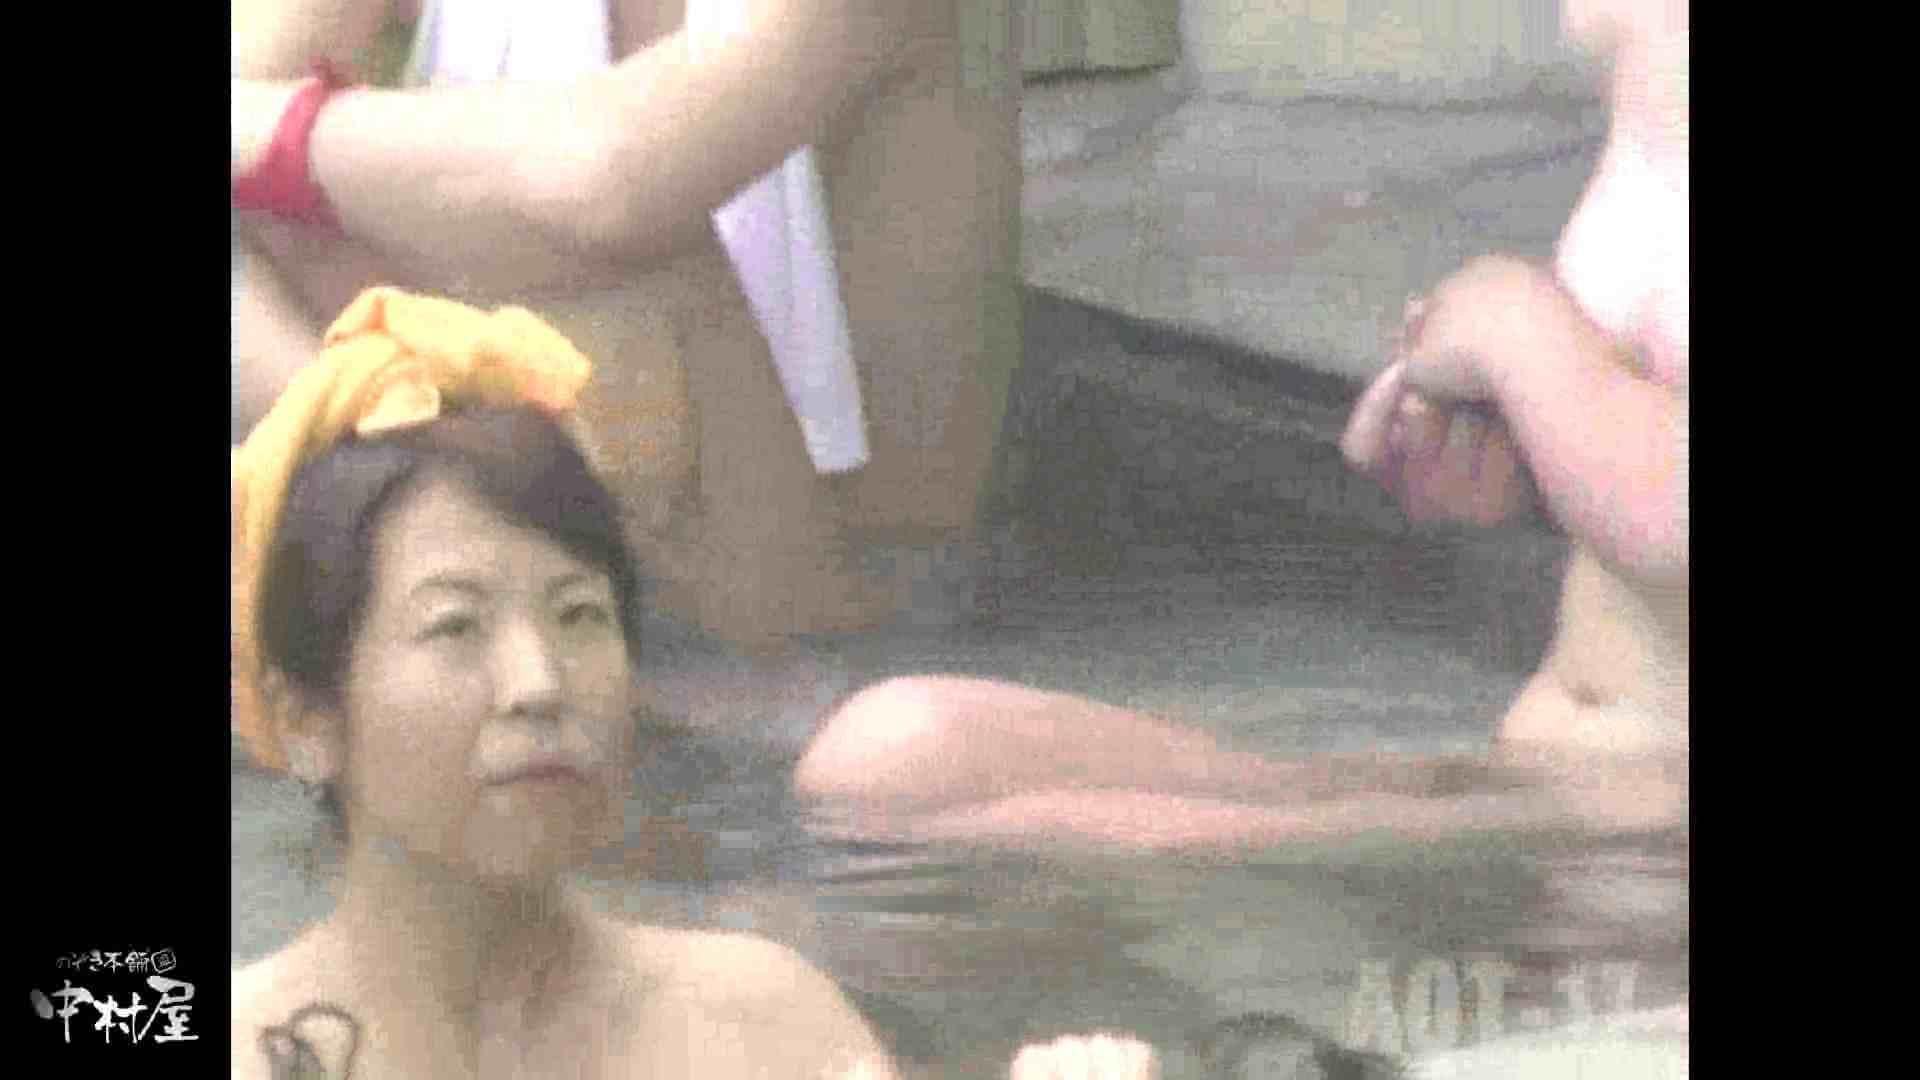 Aquaな露天風呂Vol.881潜入盗撮露天風呂十七判湯 其の五 潜入突撃  102pic 76